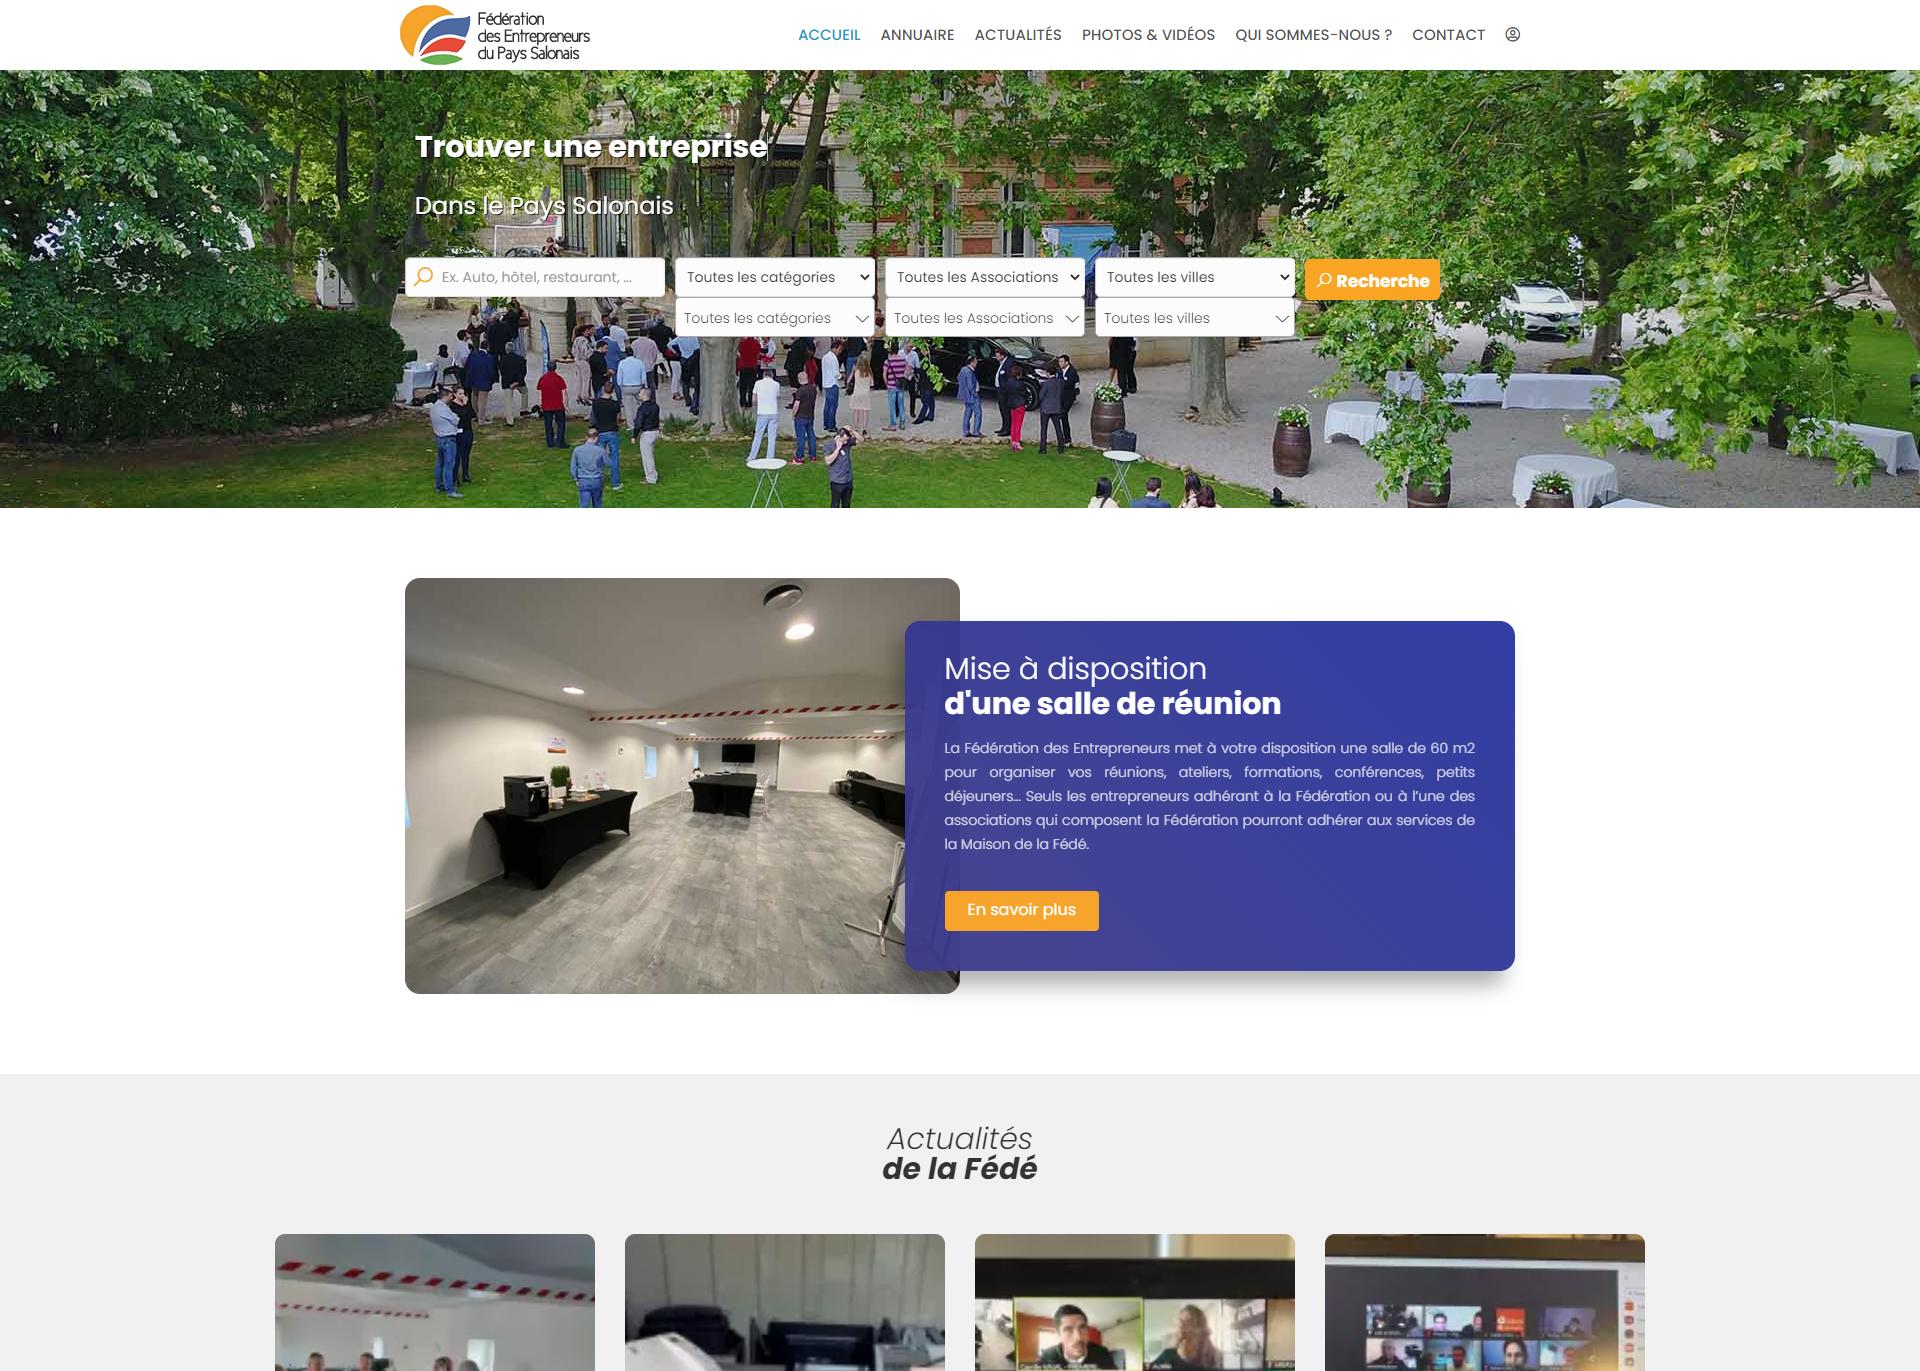 fede-entrepreneurs.fr